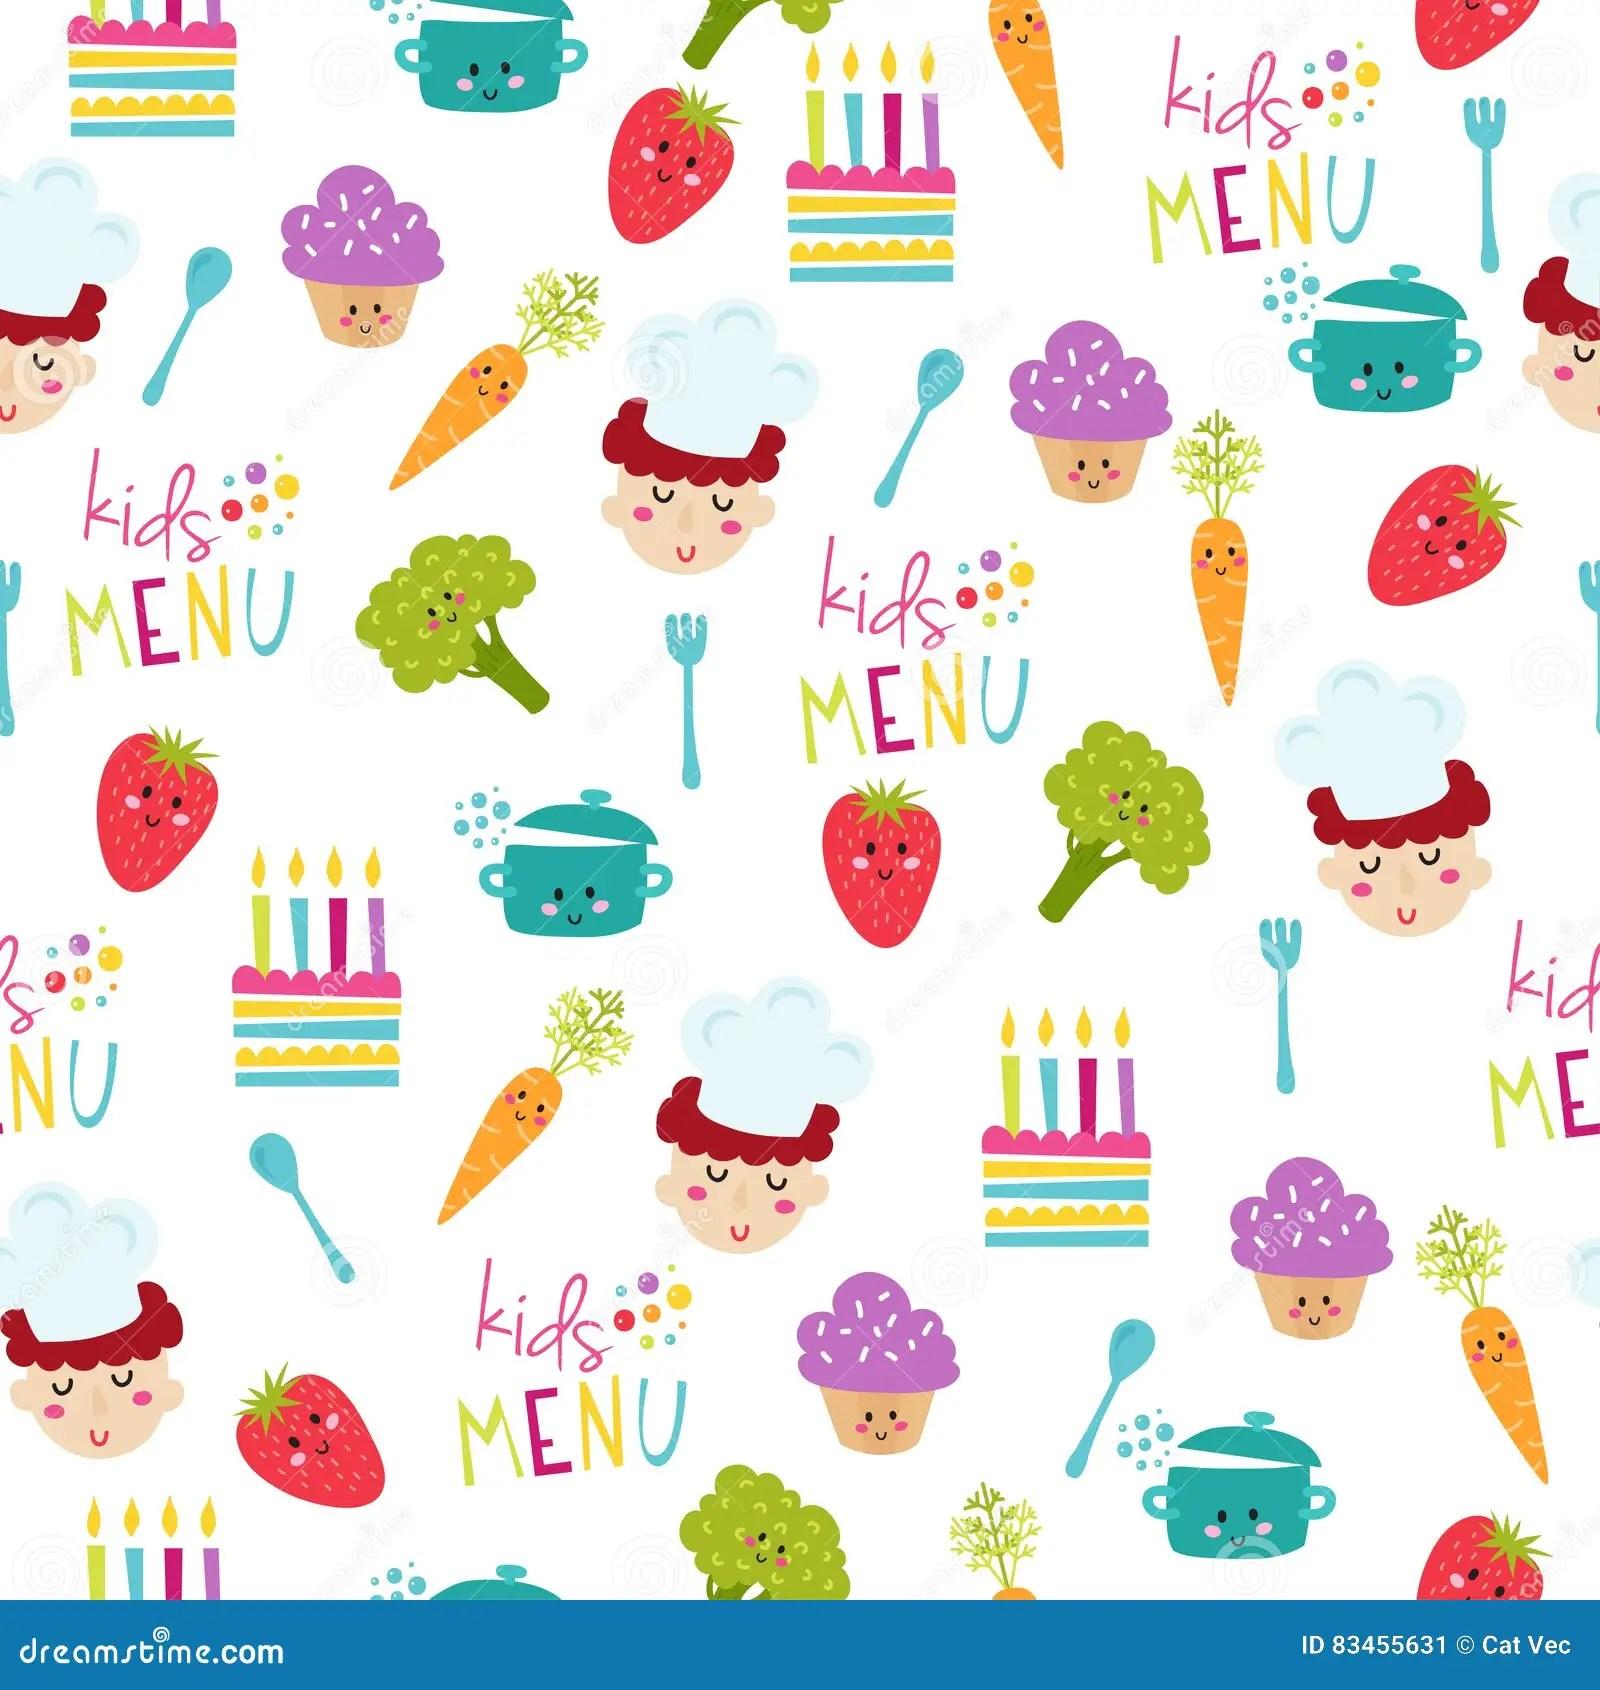 Kids Food Menu Background Vector Illustration Stock Vector - Illustration of healthy. border: 83455631